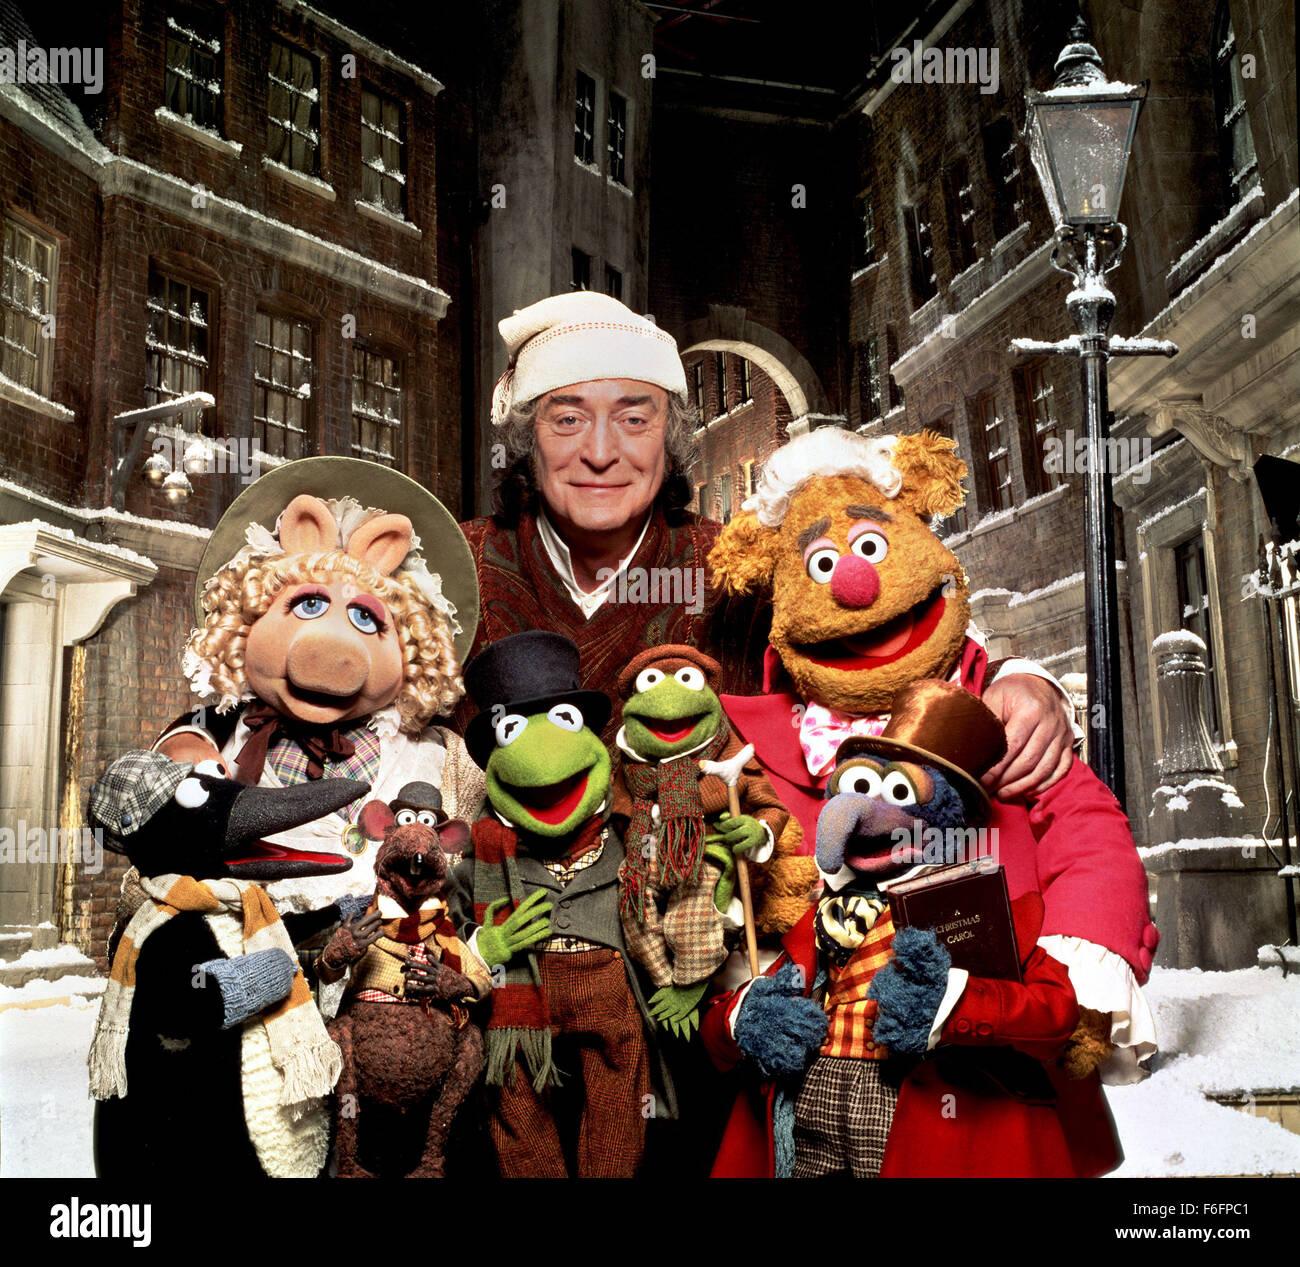 Scrooge Film Stock Photos & Scrooge Film Stock Images